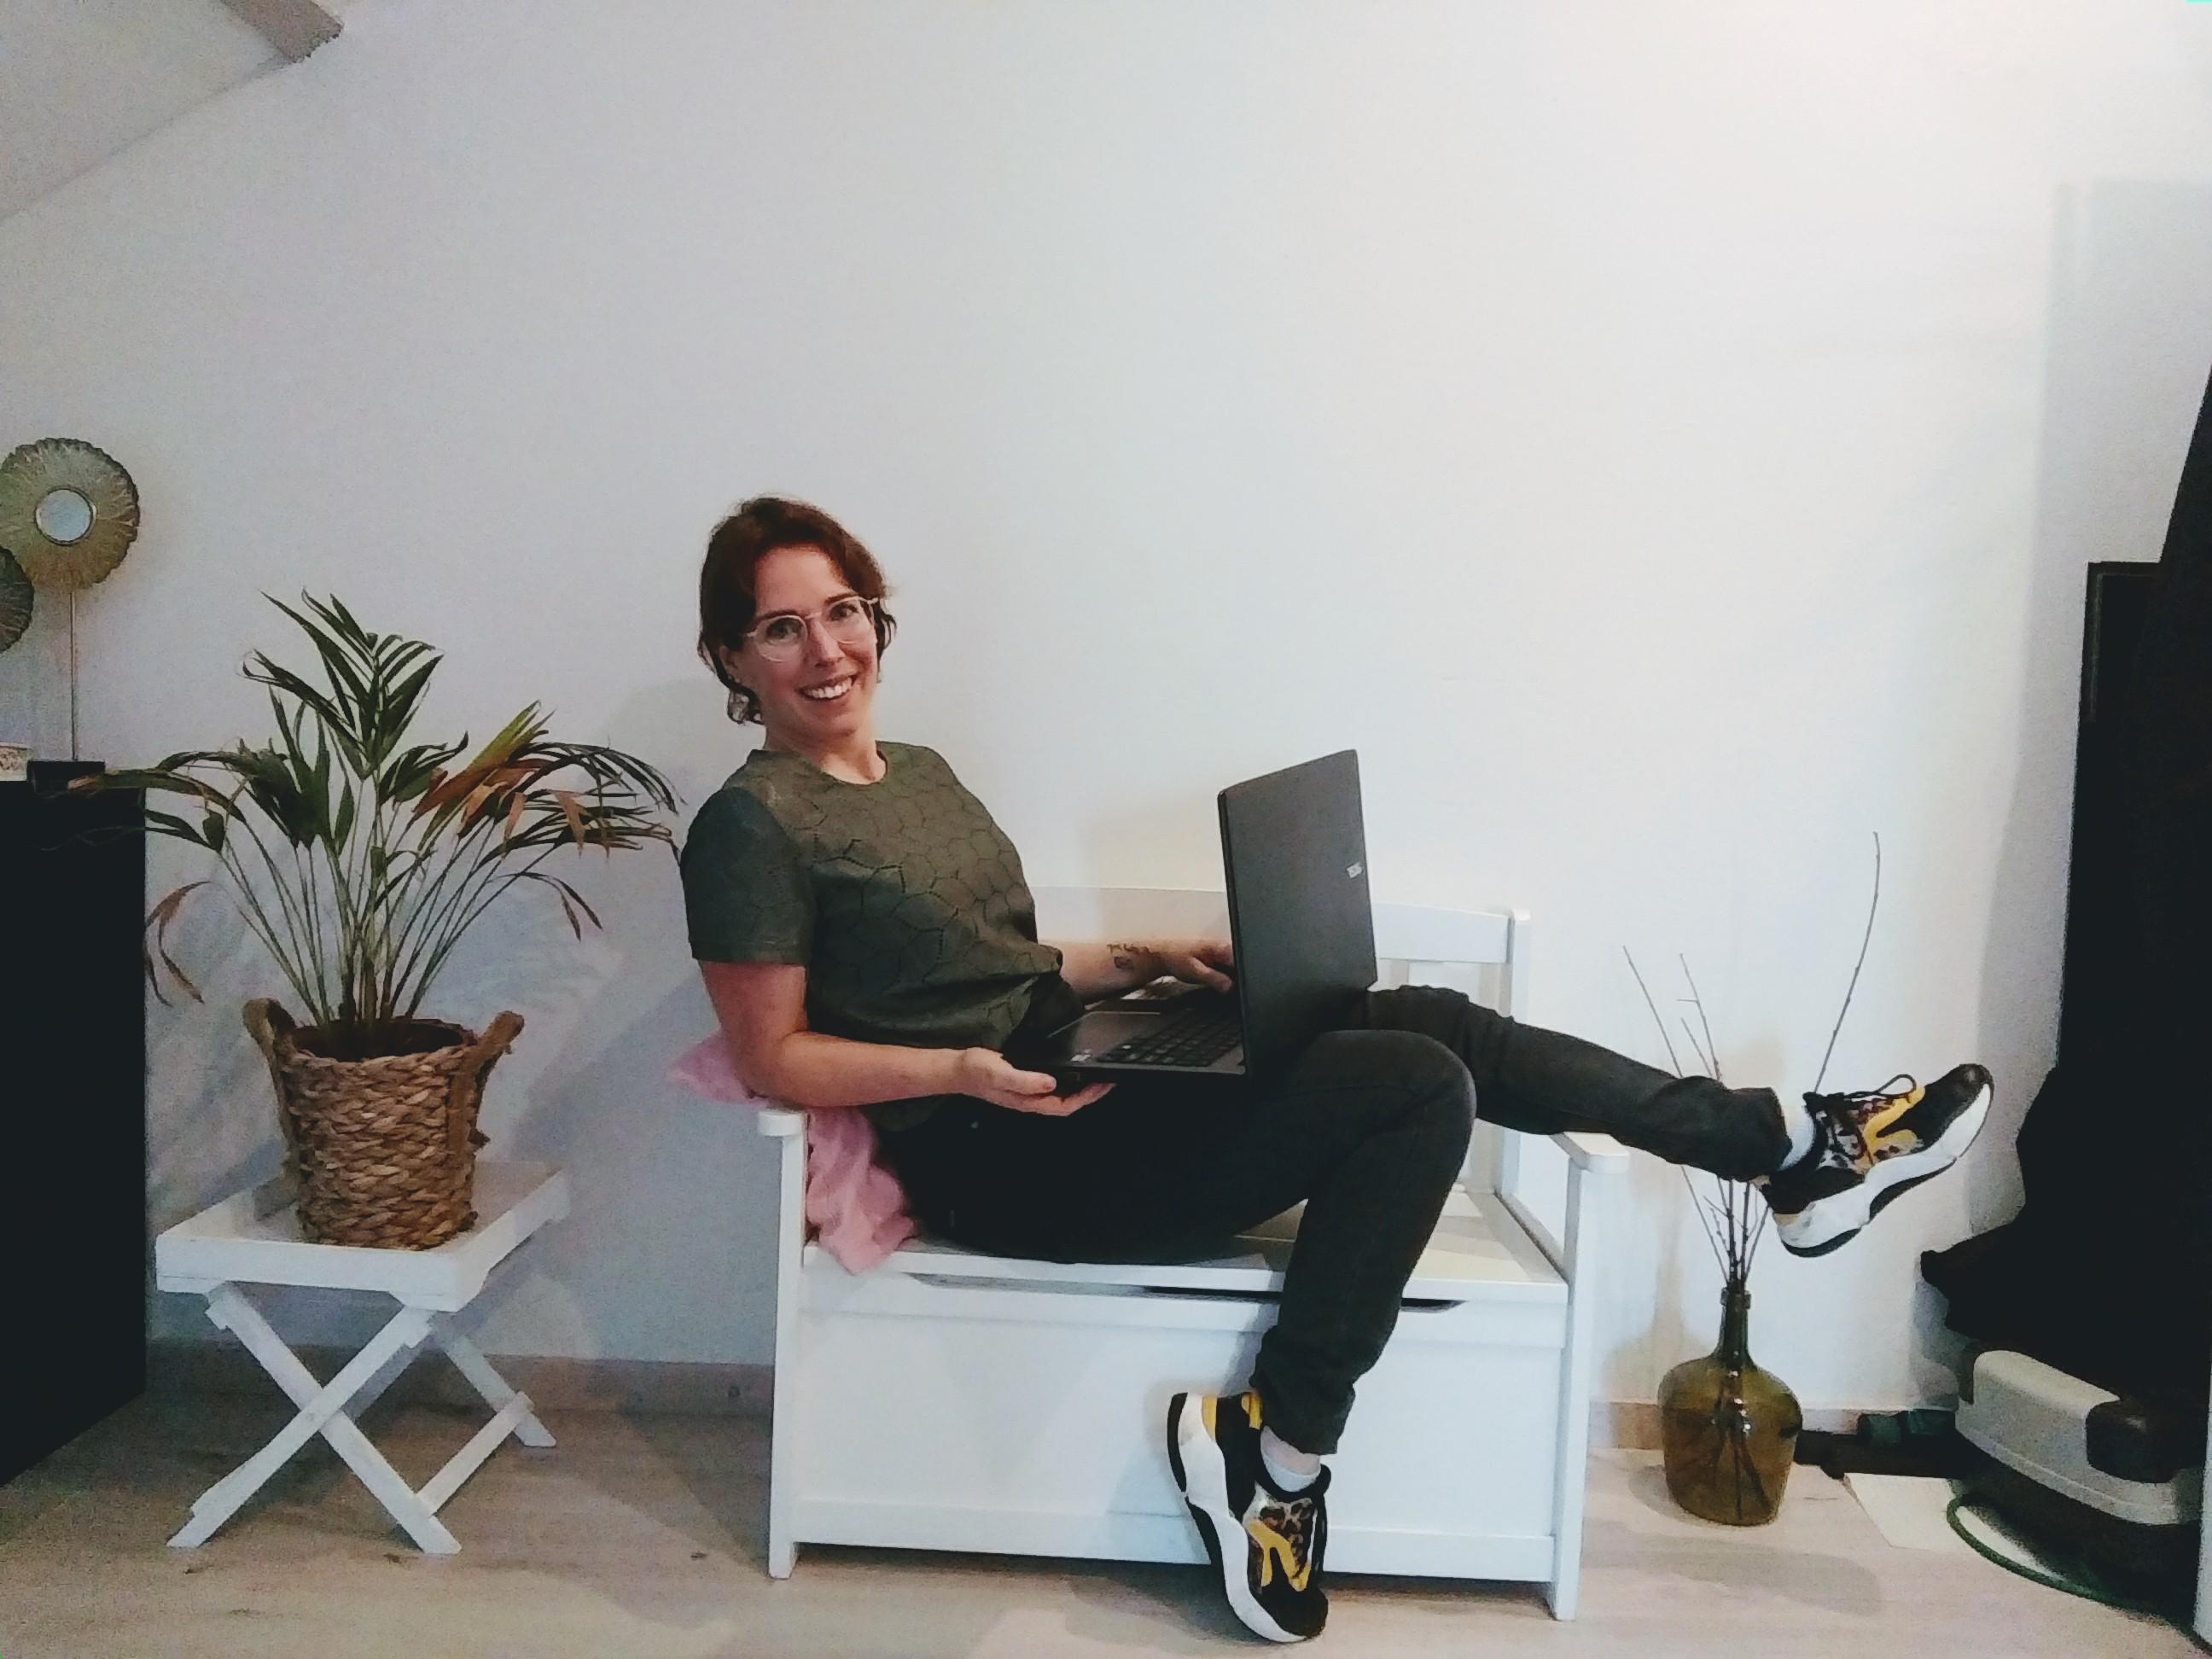 weer bloggen, schrijven, persoonlijk, mamalifestyle, mamablog, blog, lalog.nl, lalogblog